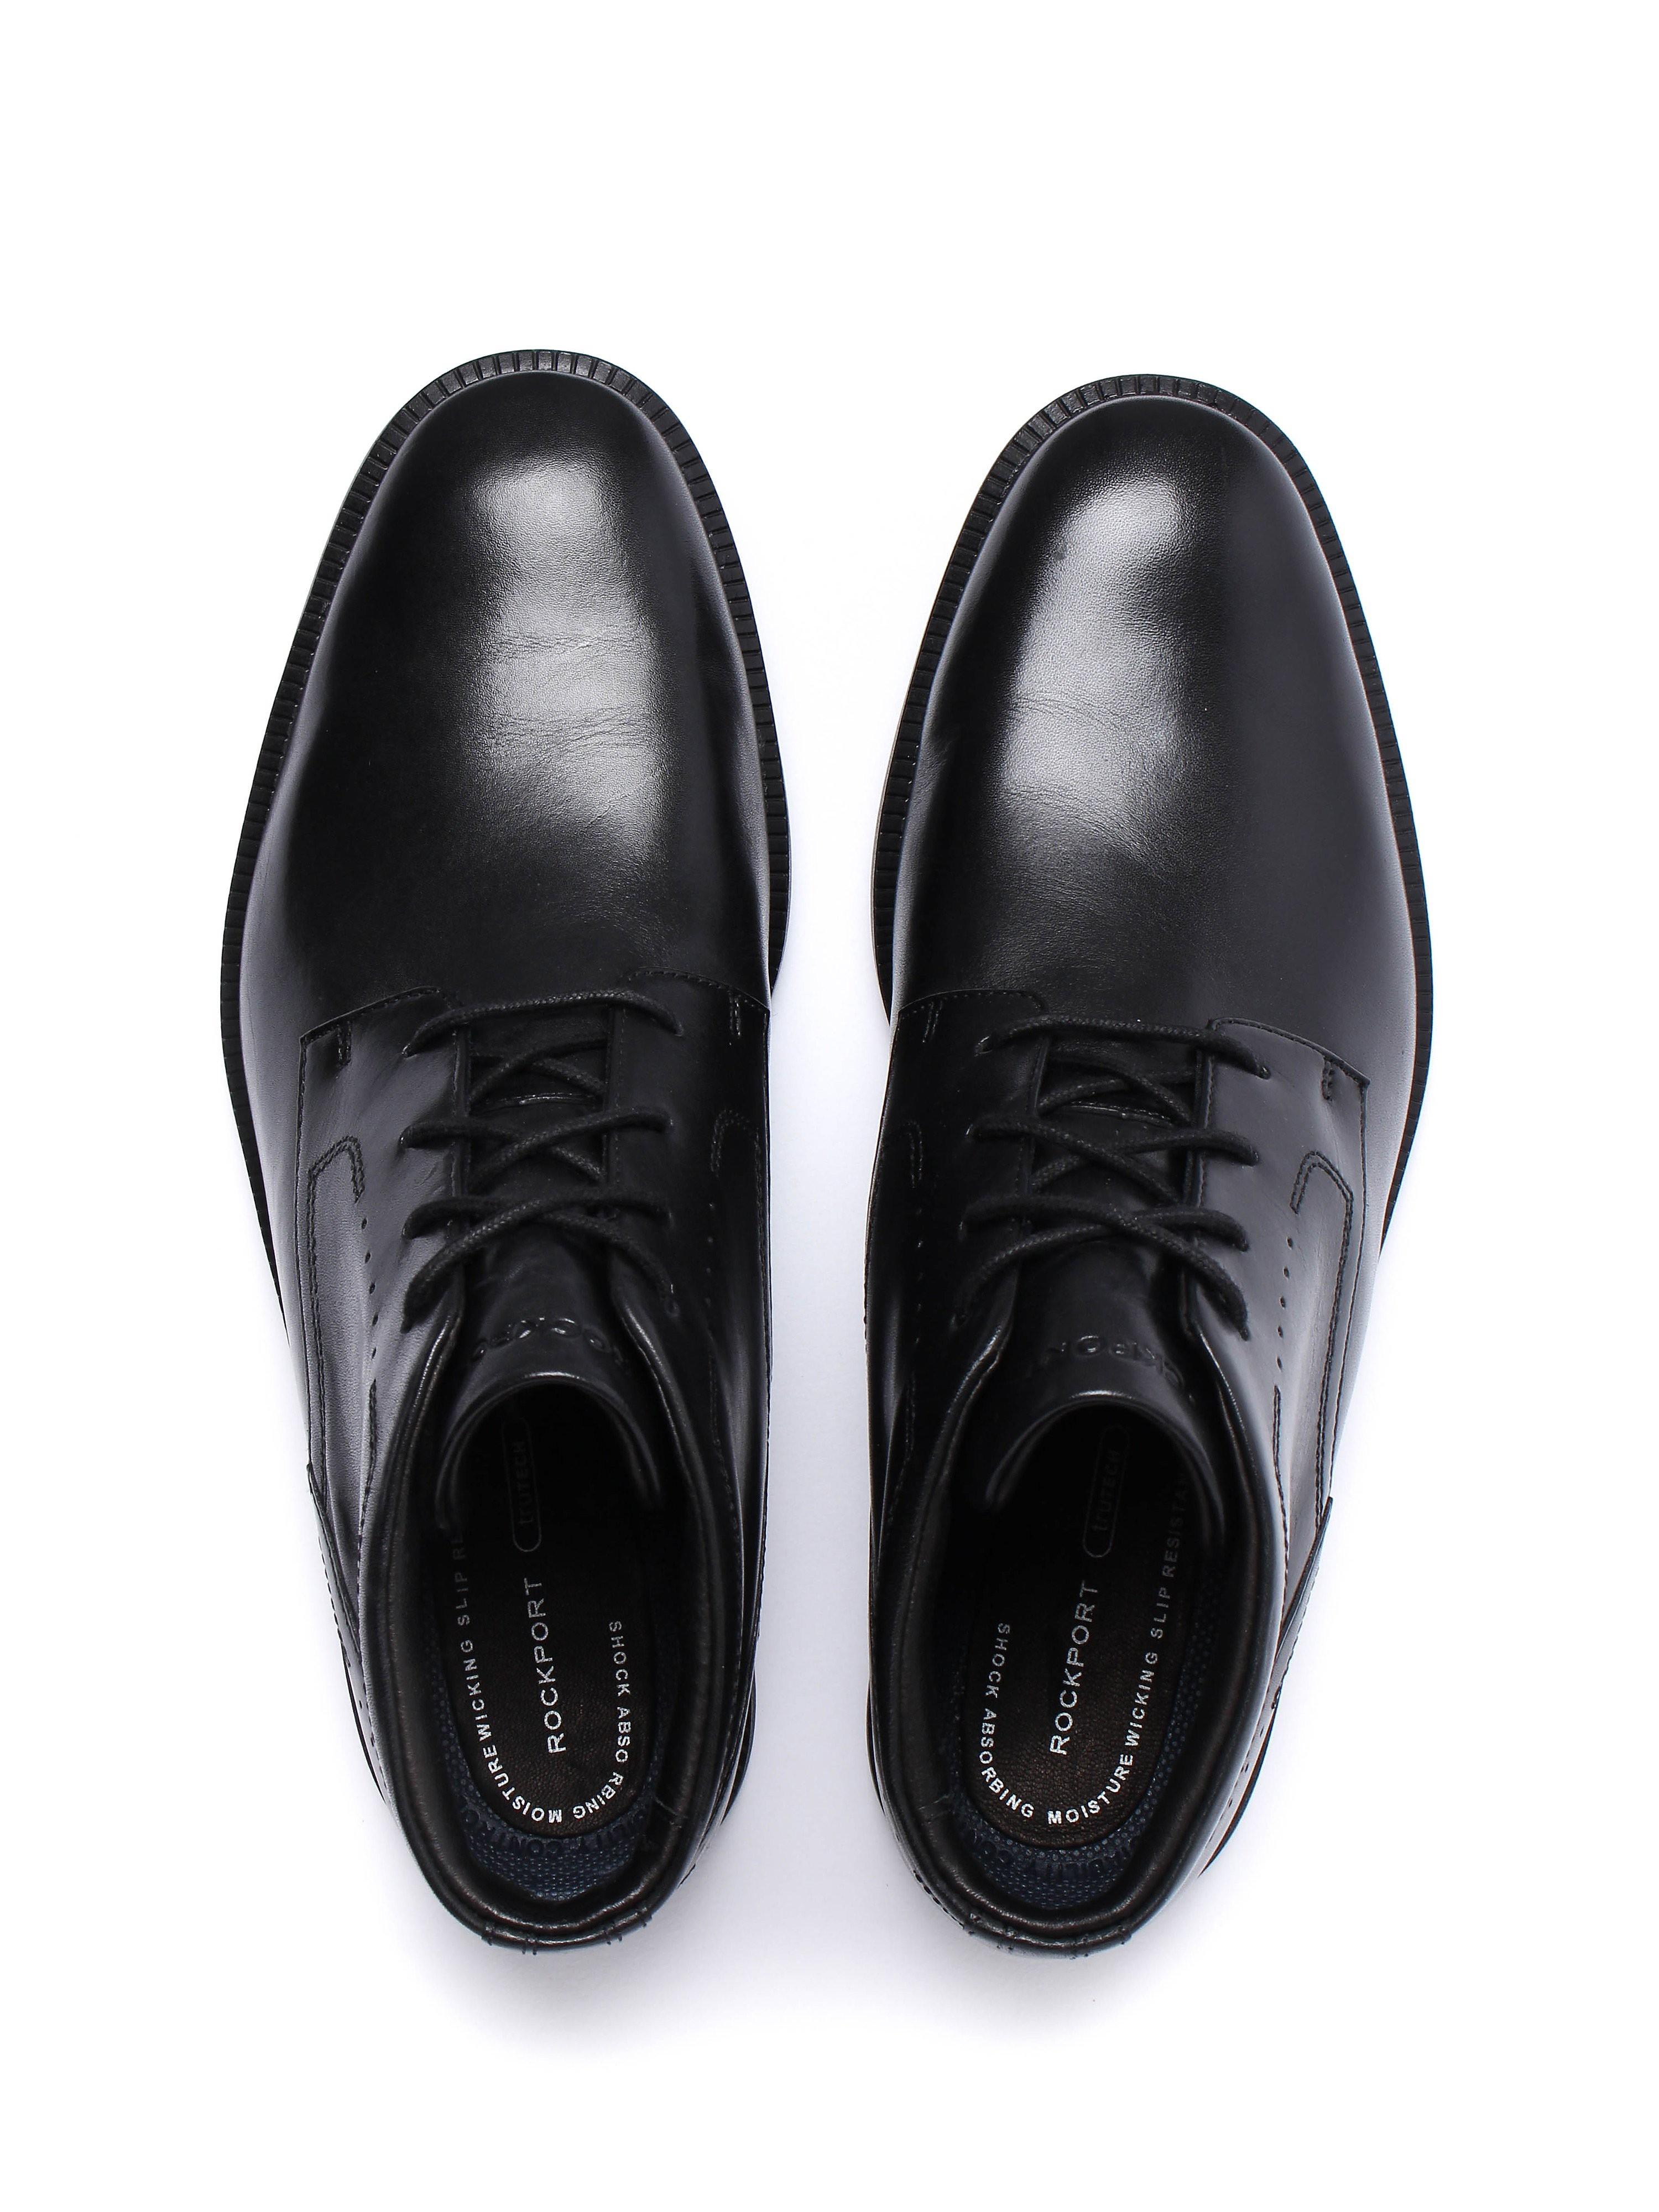 Rockport Modern Chukka Boots - Black